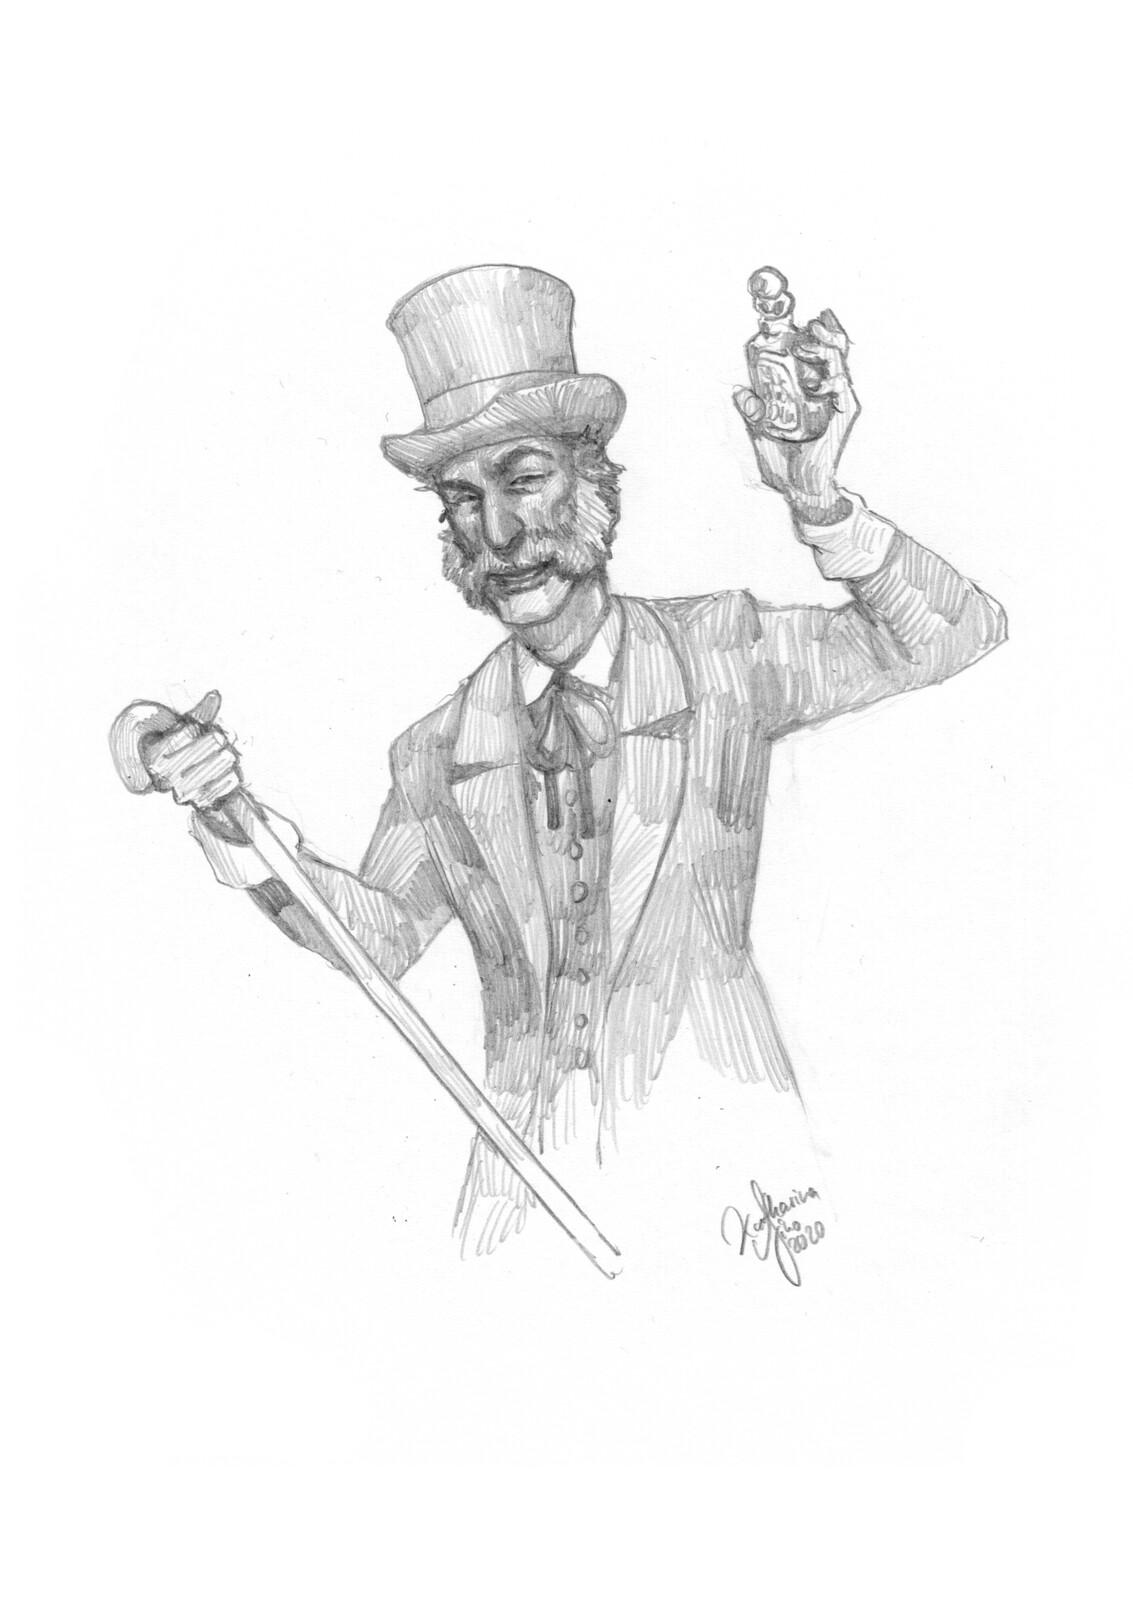 RPG character: Alchemist